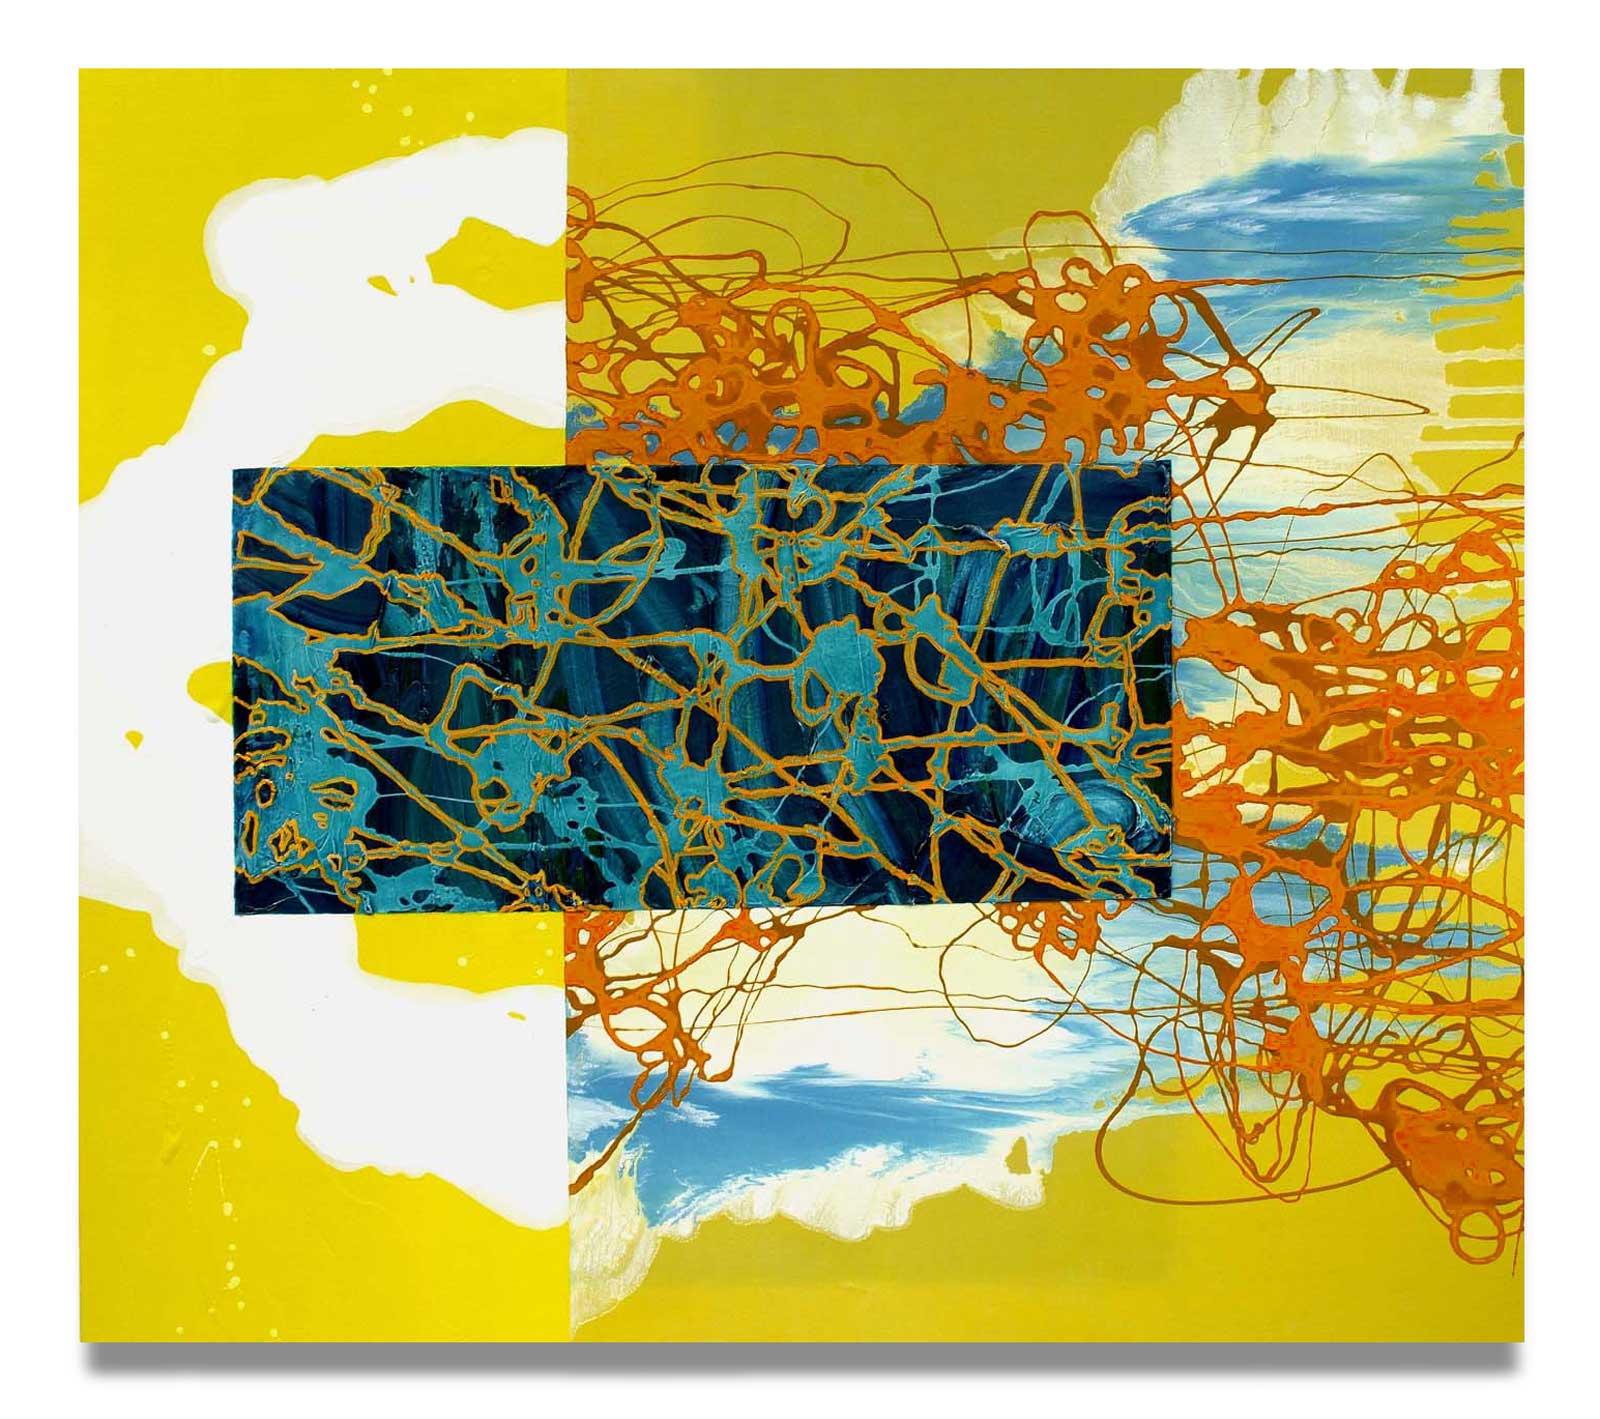 Undercurrent - Oil on Canvas - 162.56 cm x 182.88 cm.